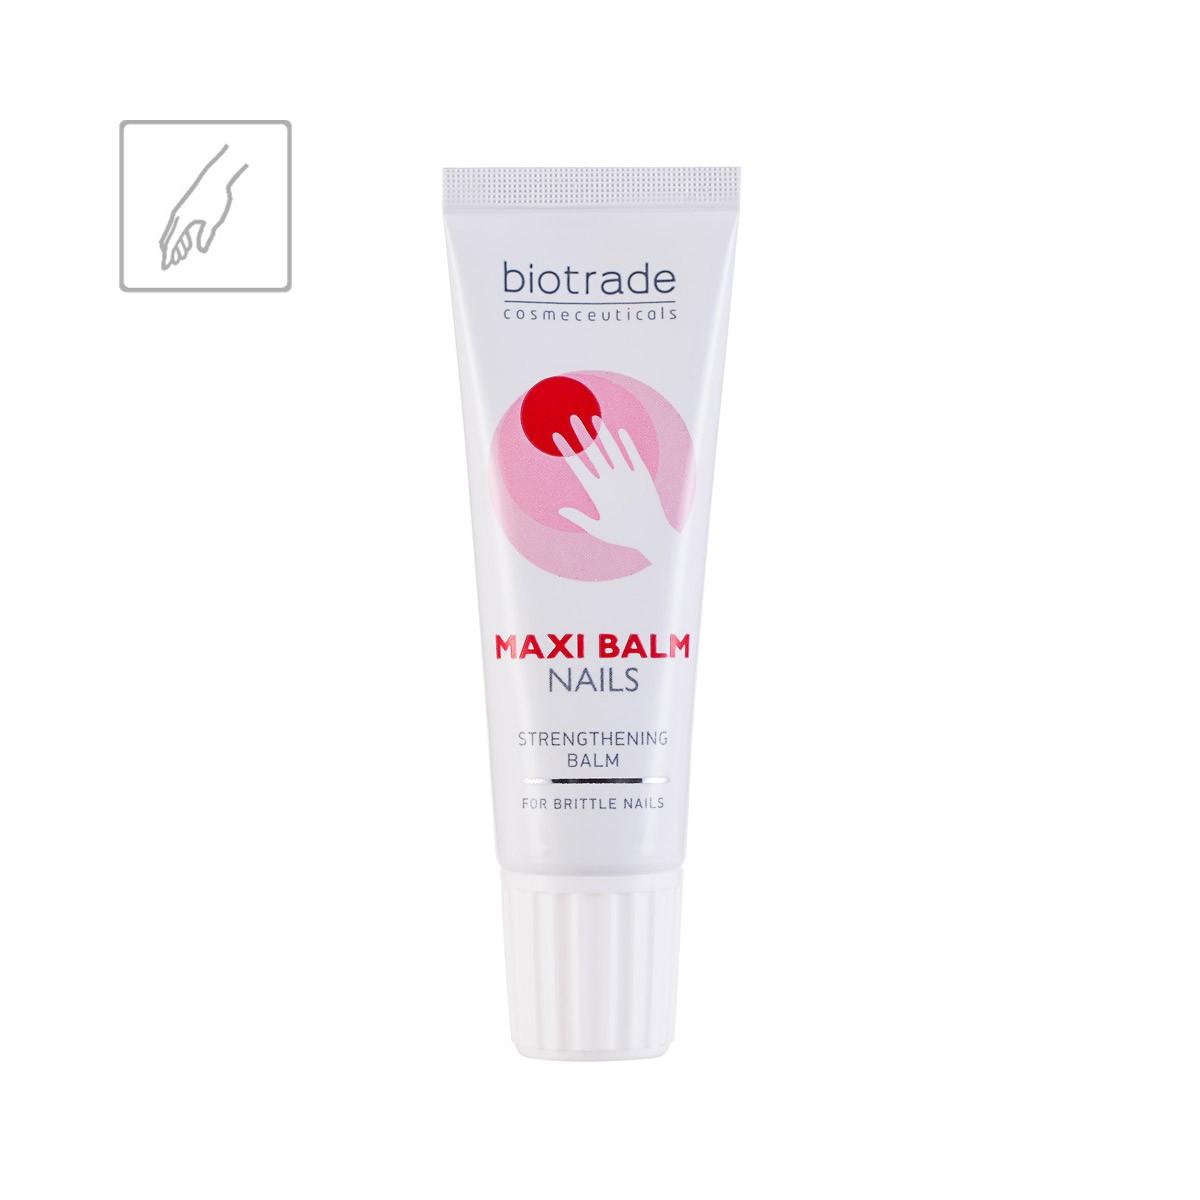 Keratolin Maxi Nail Balm Biotrade hojivý balzám na nehty